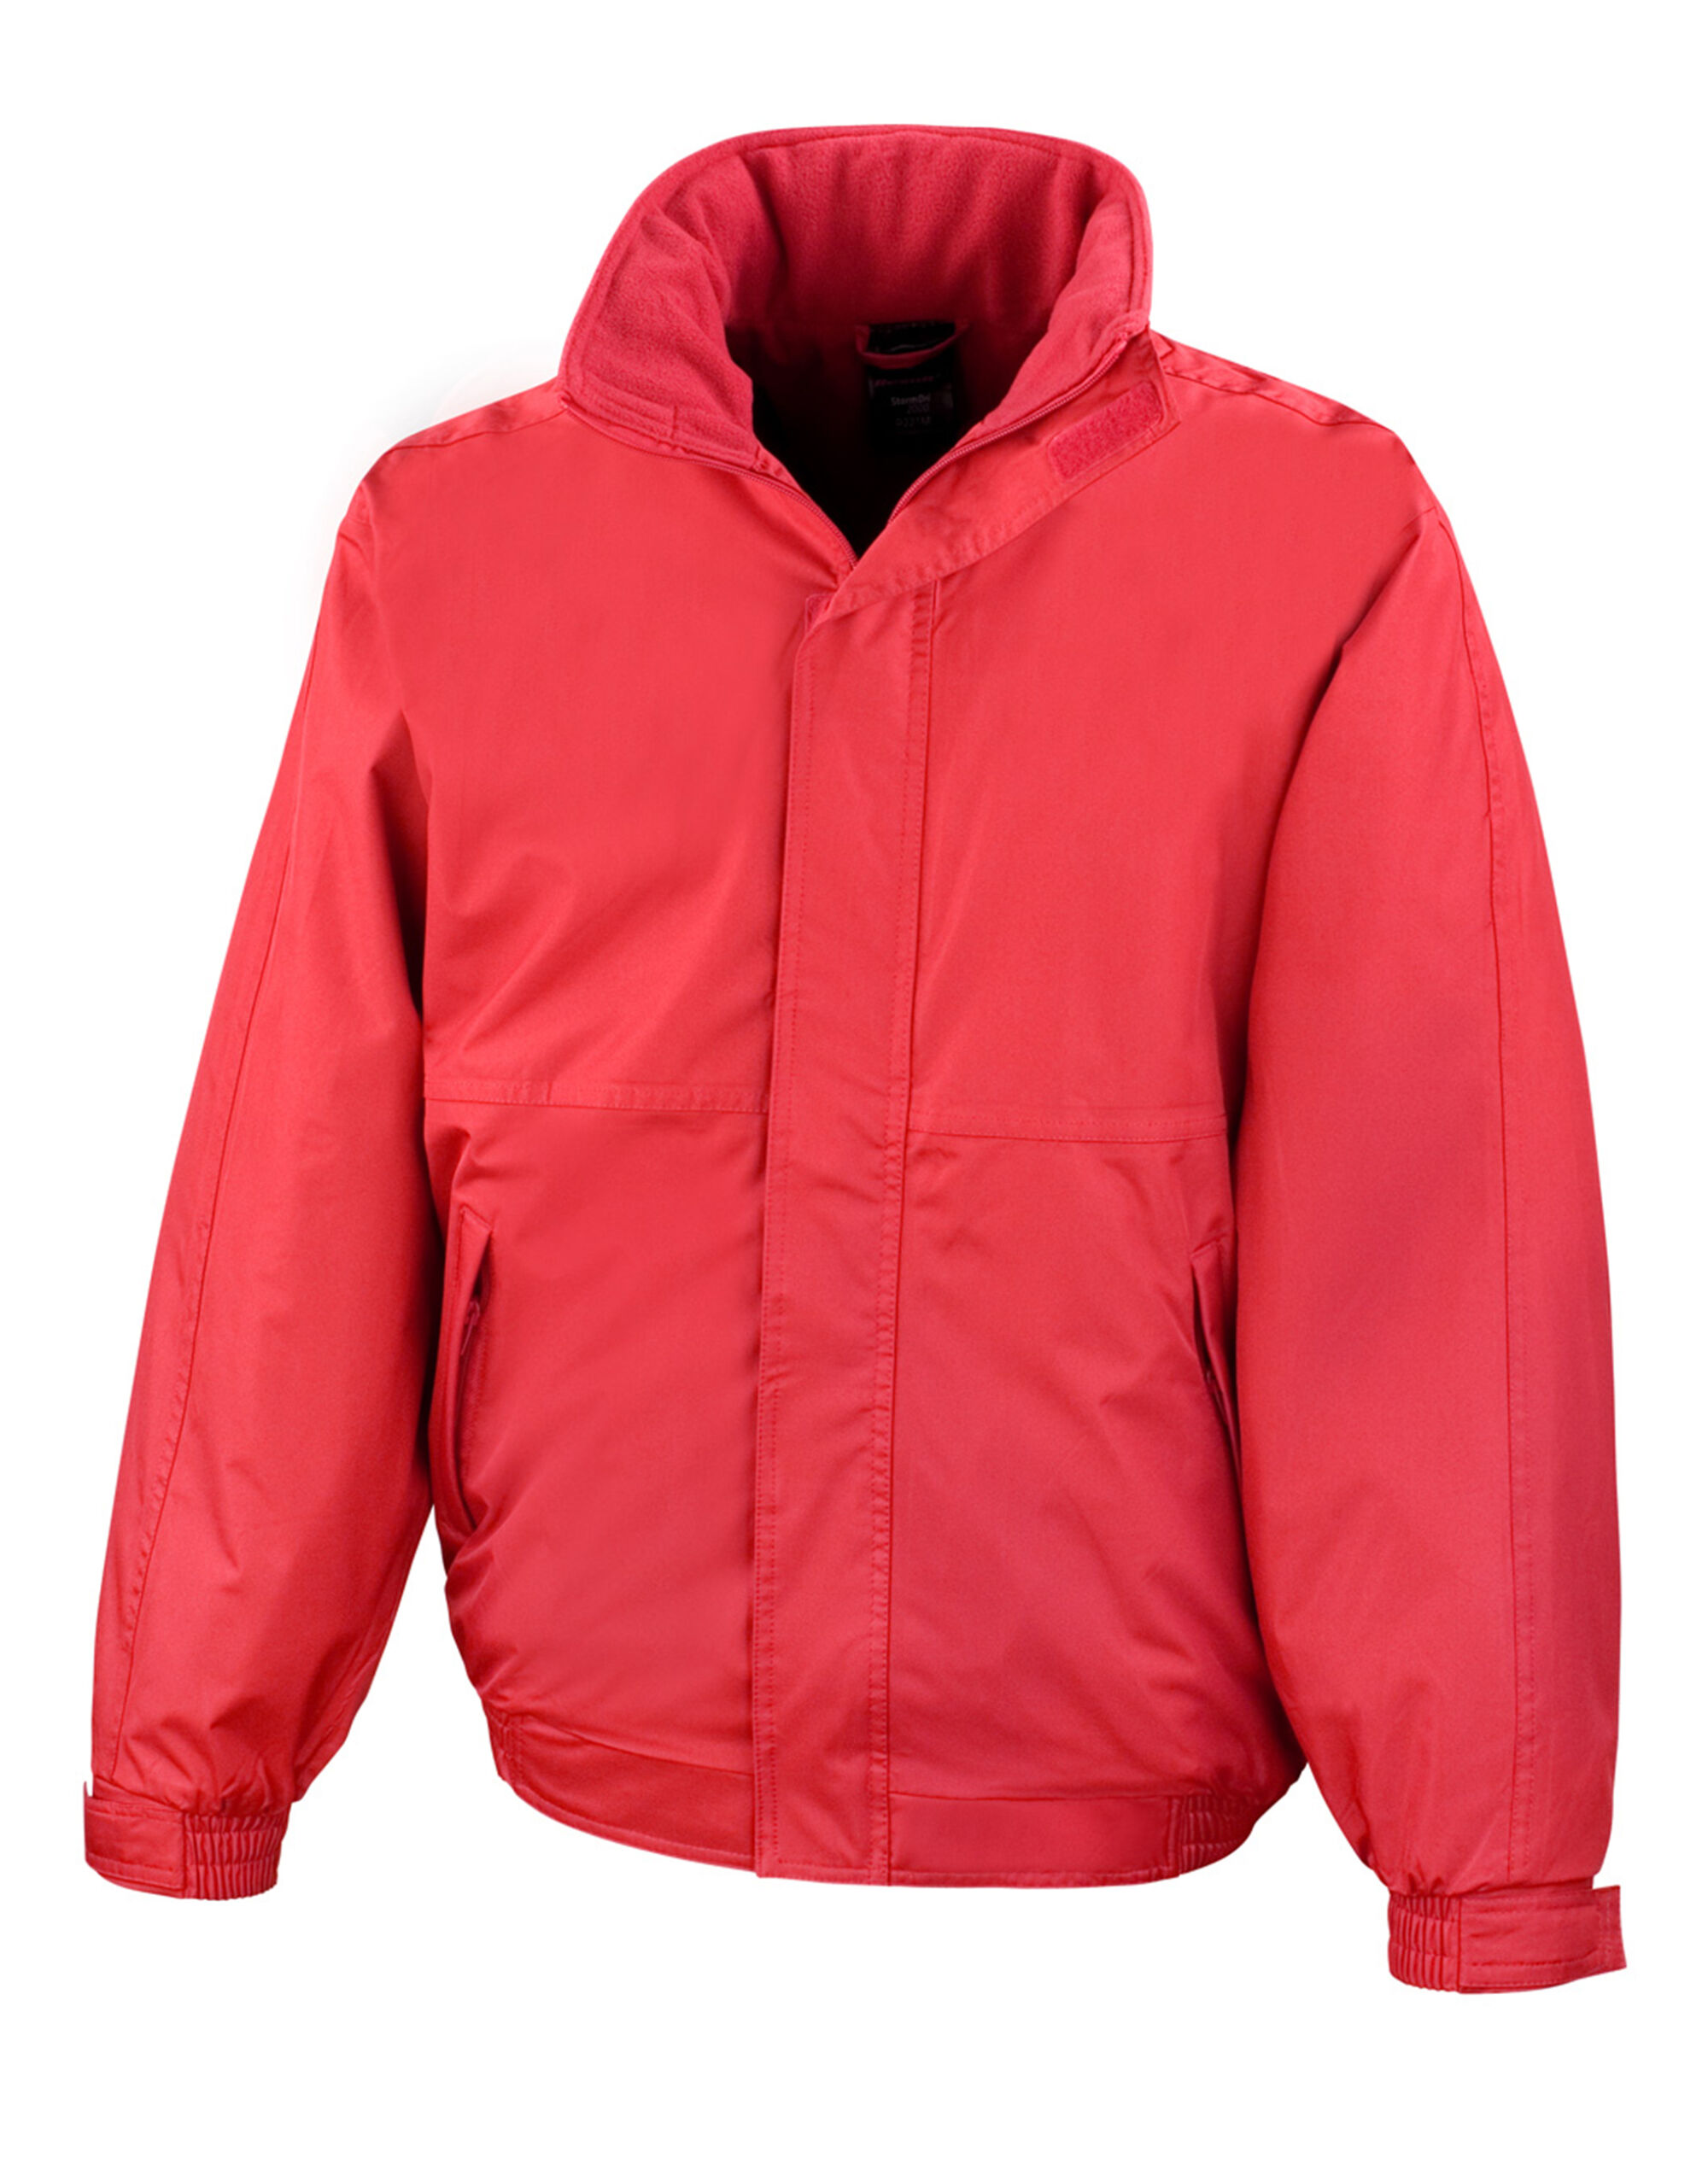 Mens Channel Jacket